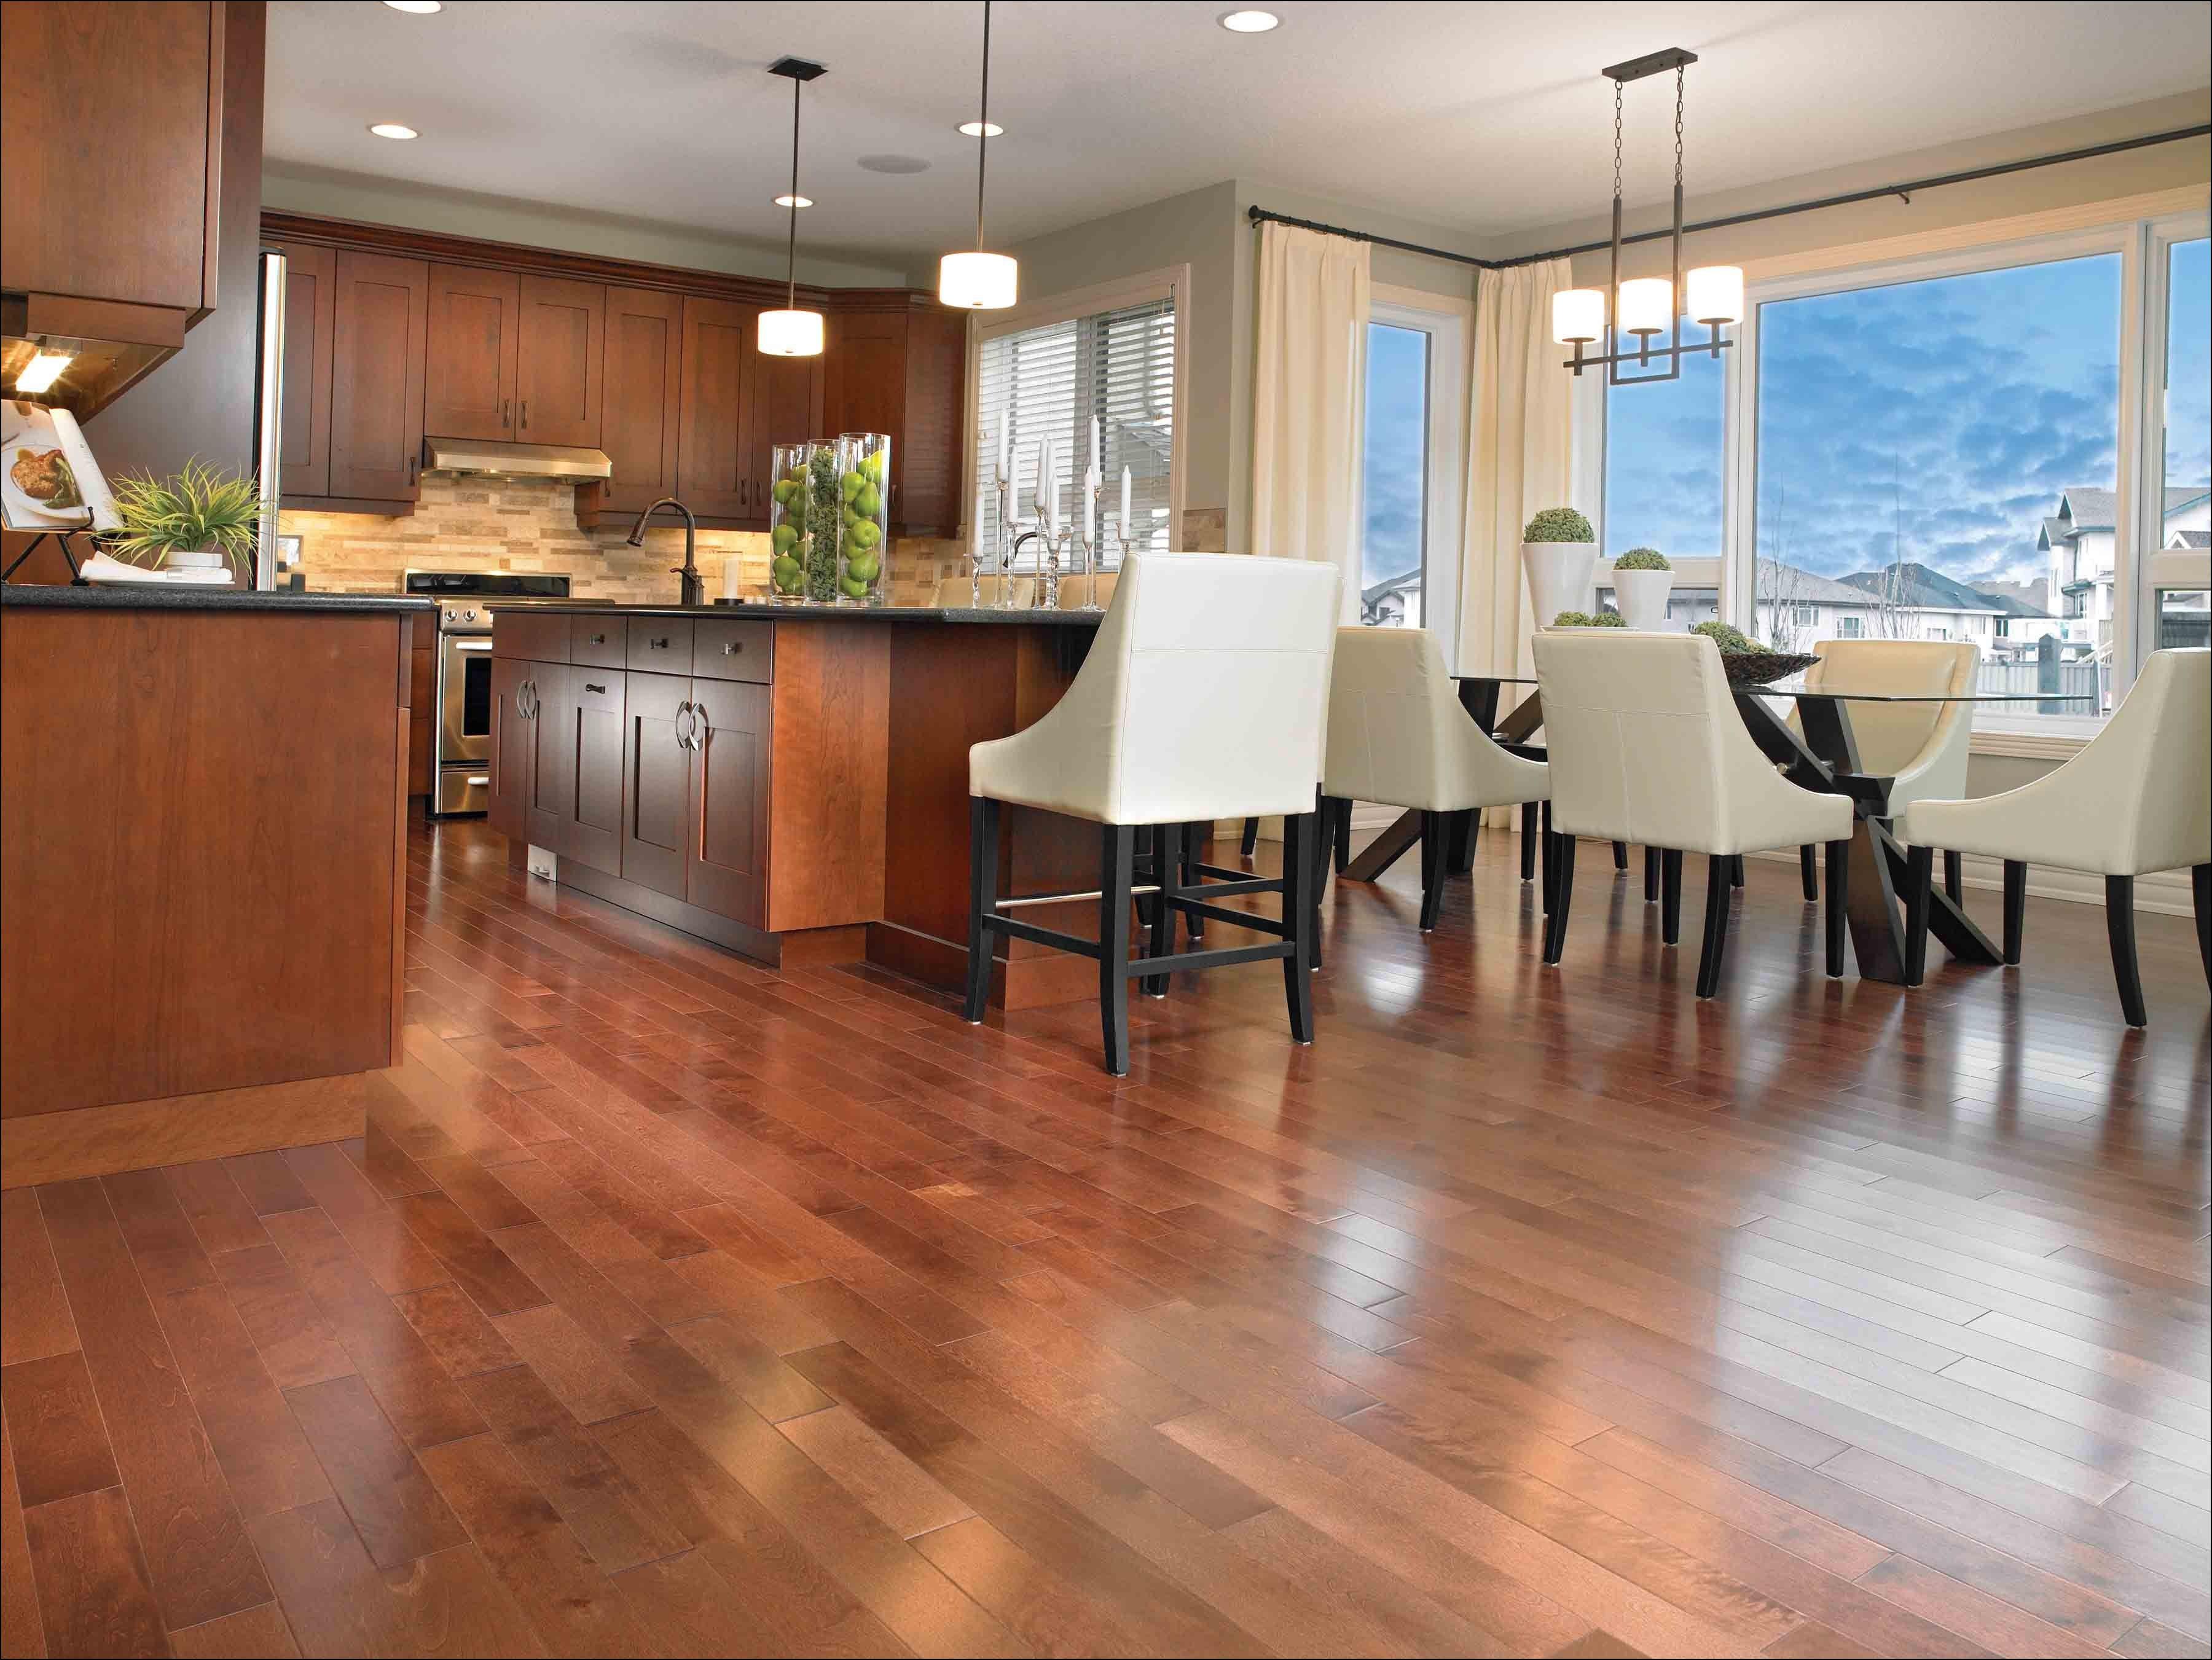 hardwood flooring lengths of hardwood flooring suppliers france flooring ideas intended for hardwood flooring installation san diego images 54 best exotic flooring images on pinterest of hardwood flooring